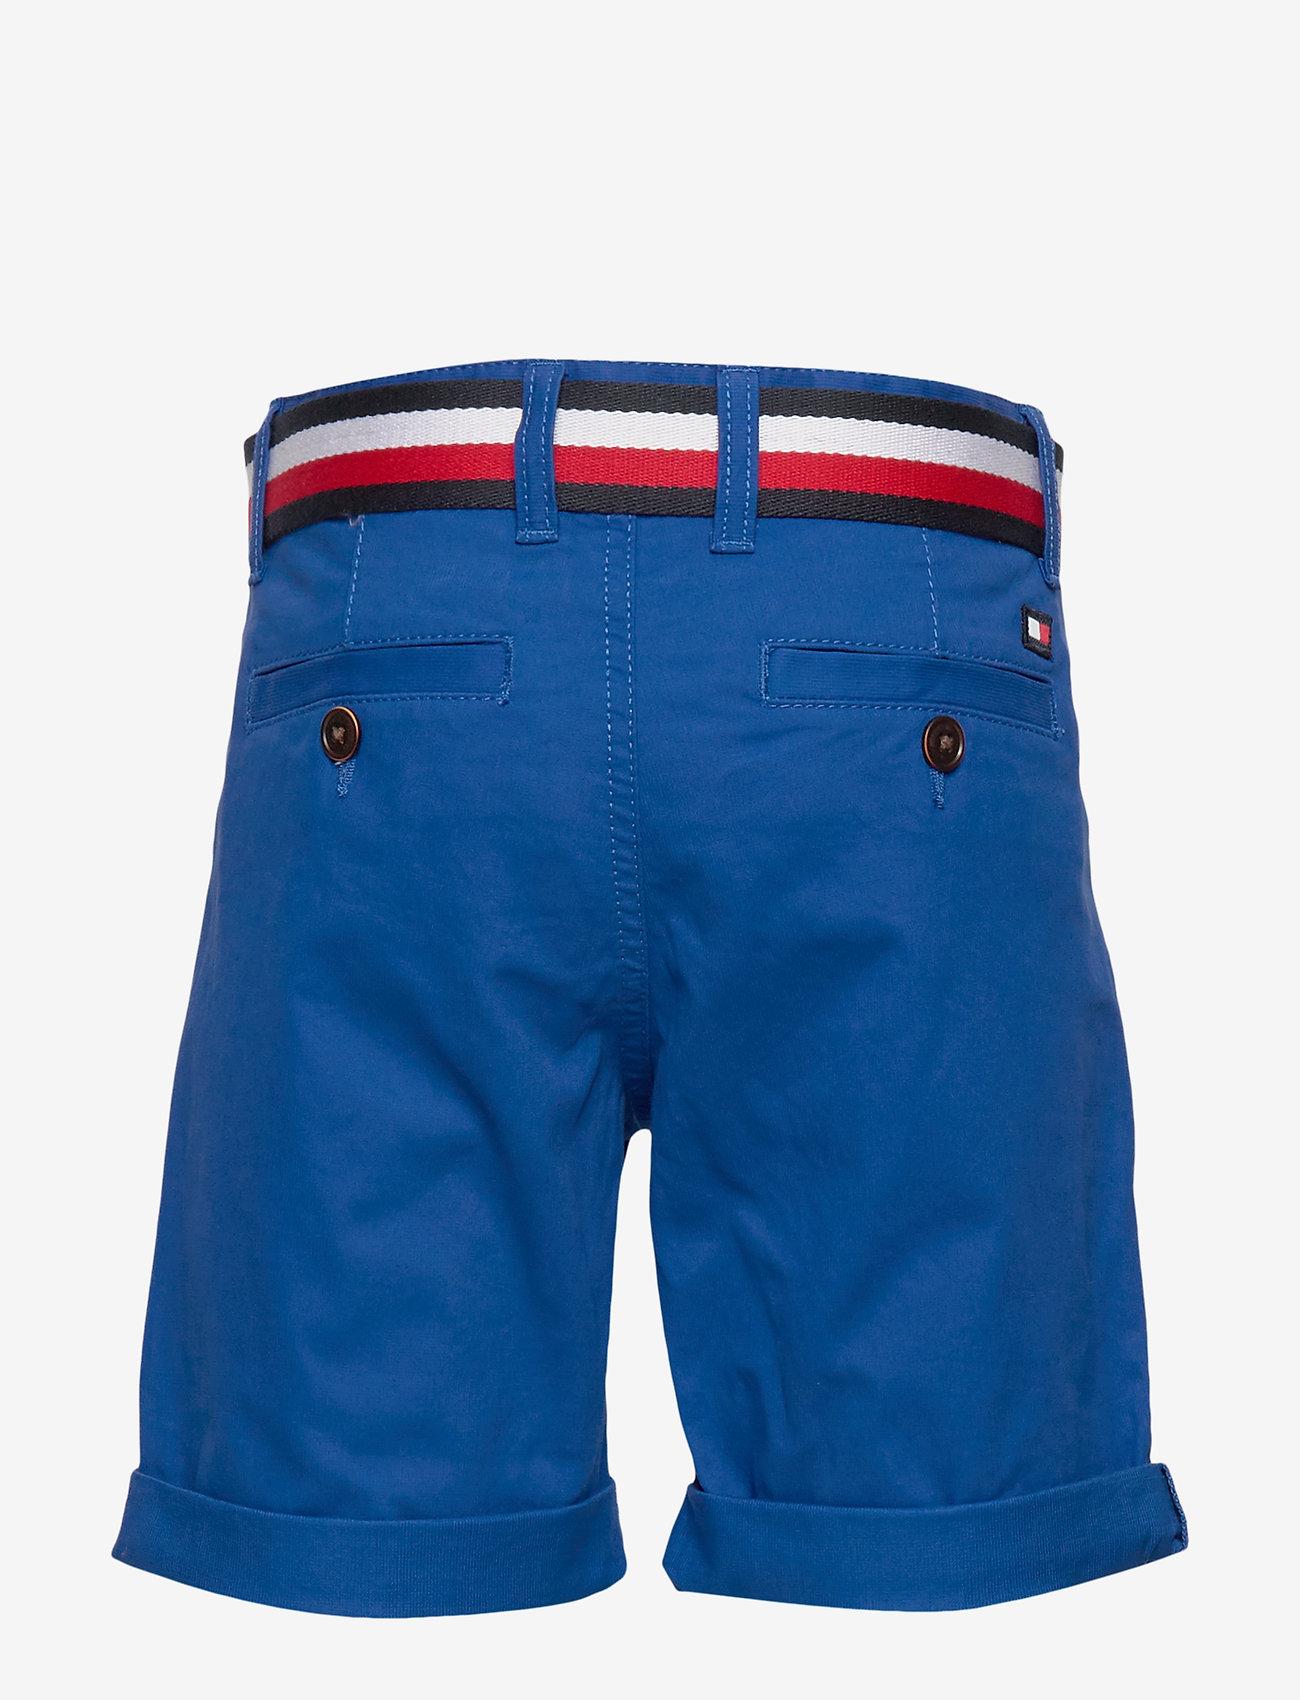 Tommy Hilfiger - ESSENTIAL BELTED CHI - shorts - lapis lazuli - 1